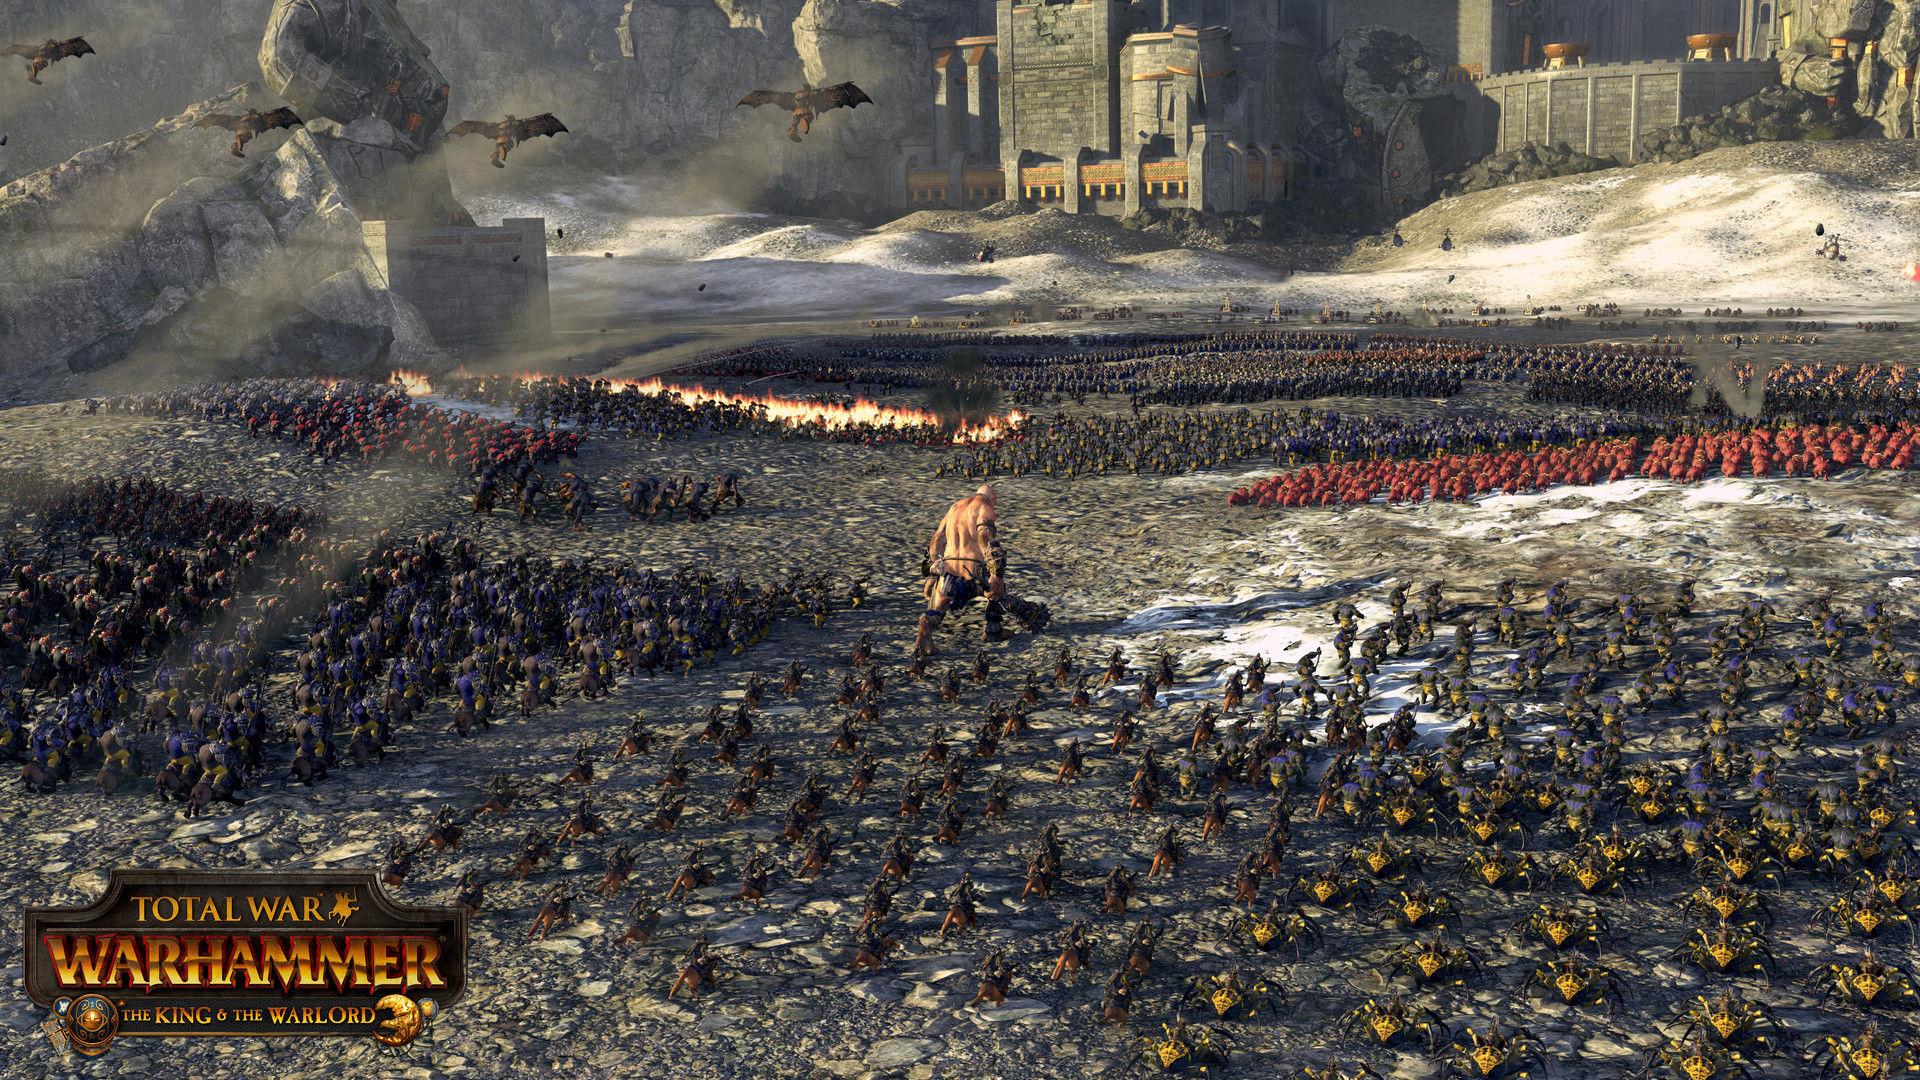 Total War: Warhammer - Total War: Warhammer